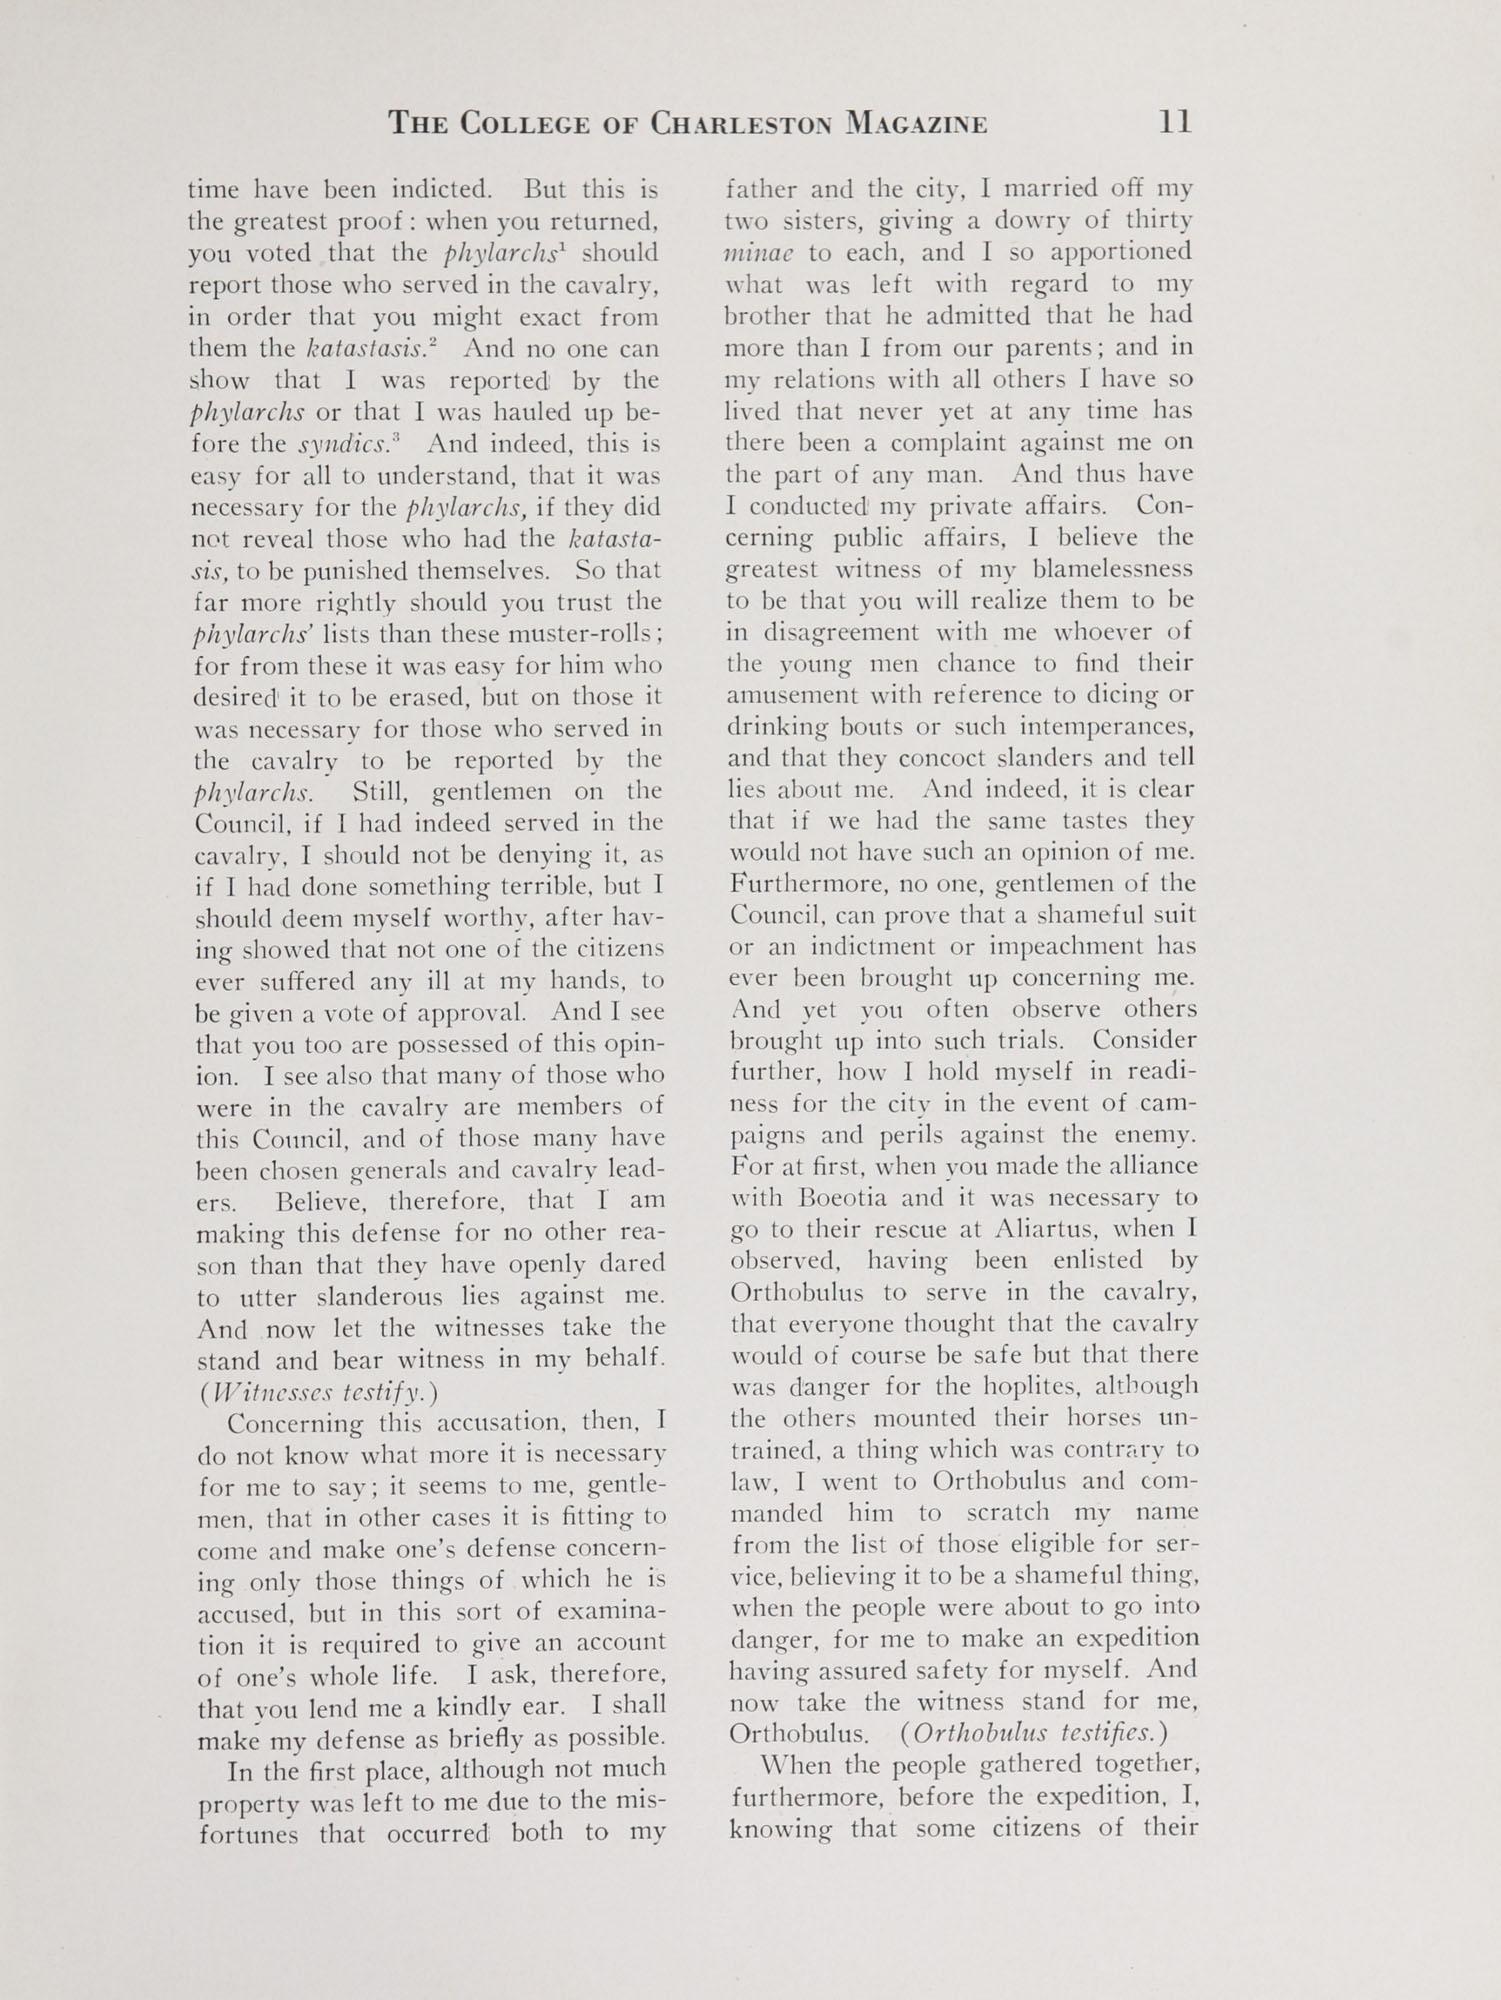 College of Charleston Magazine, 1938-1939, Vol. XXXXII No. 1, page 11